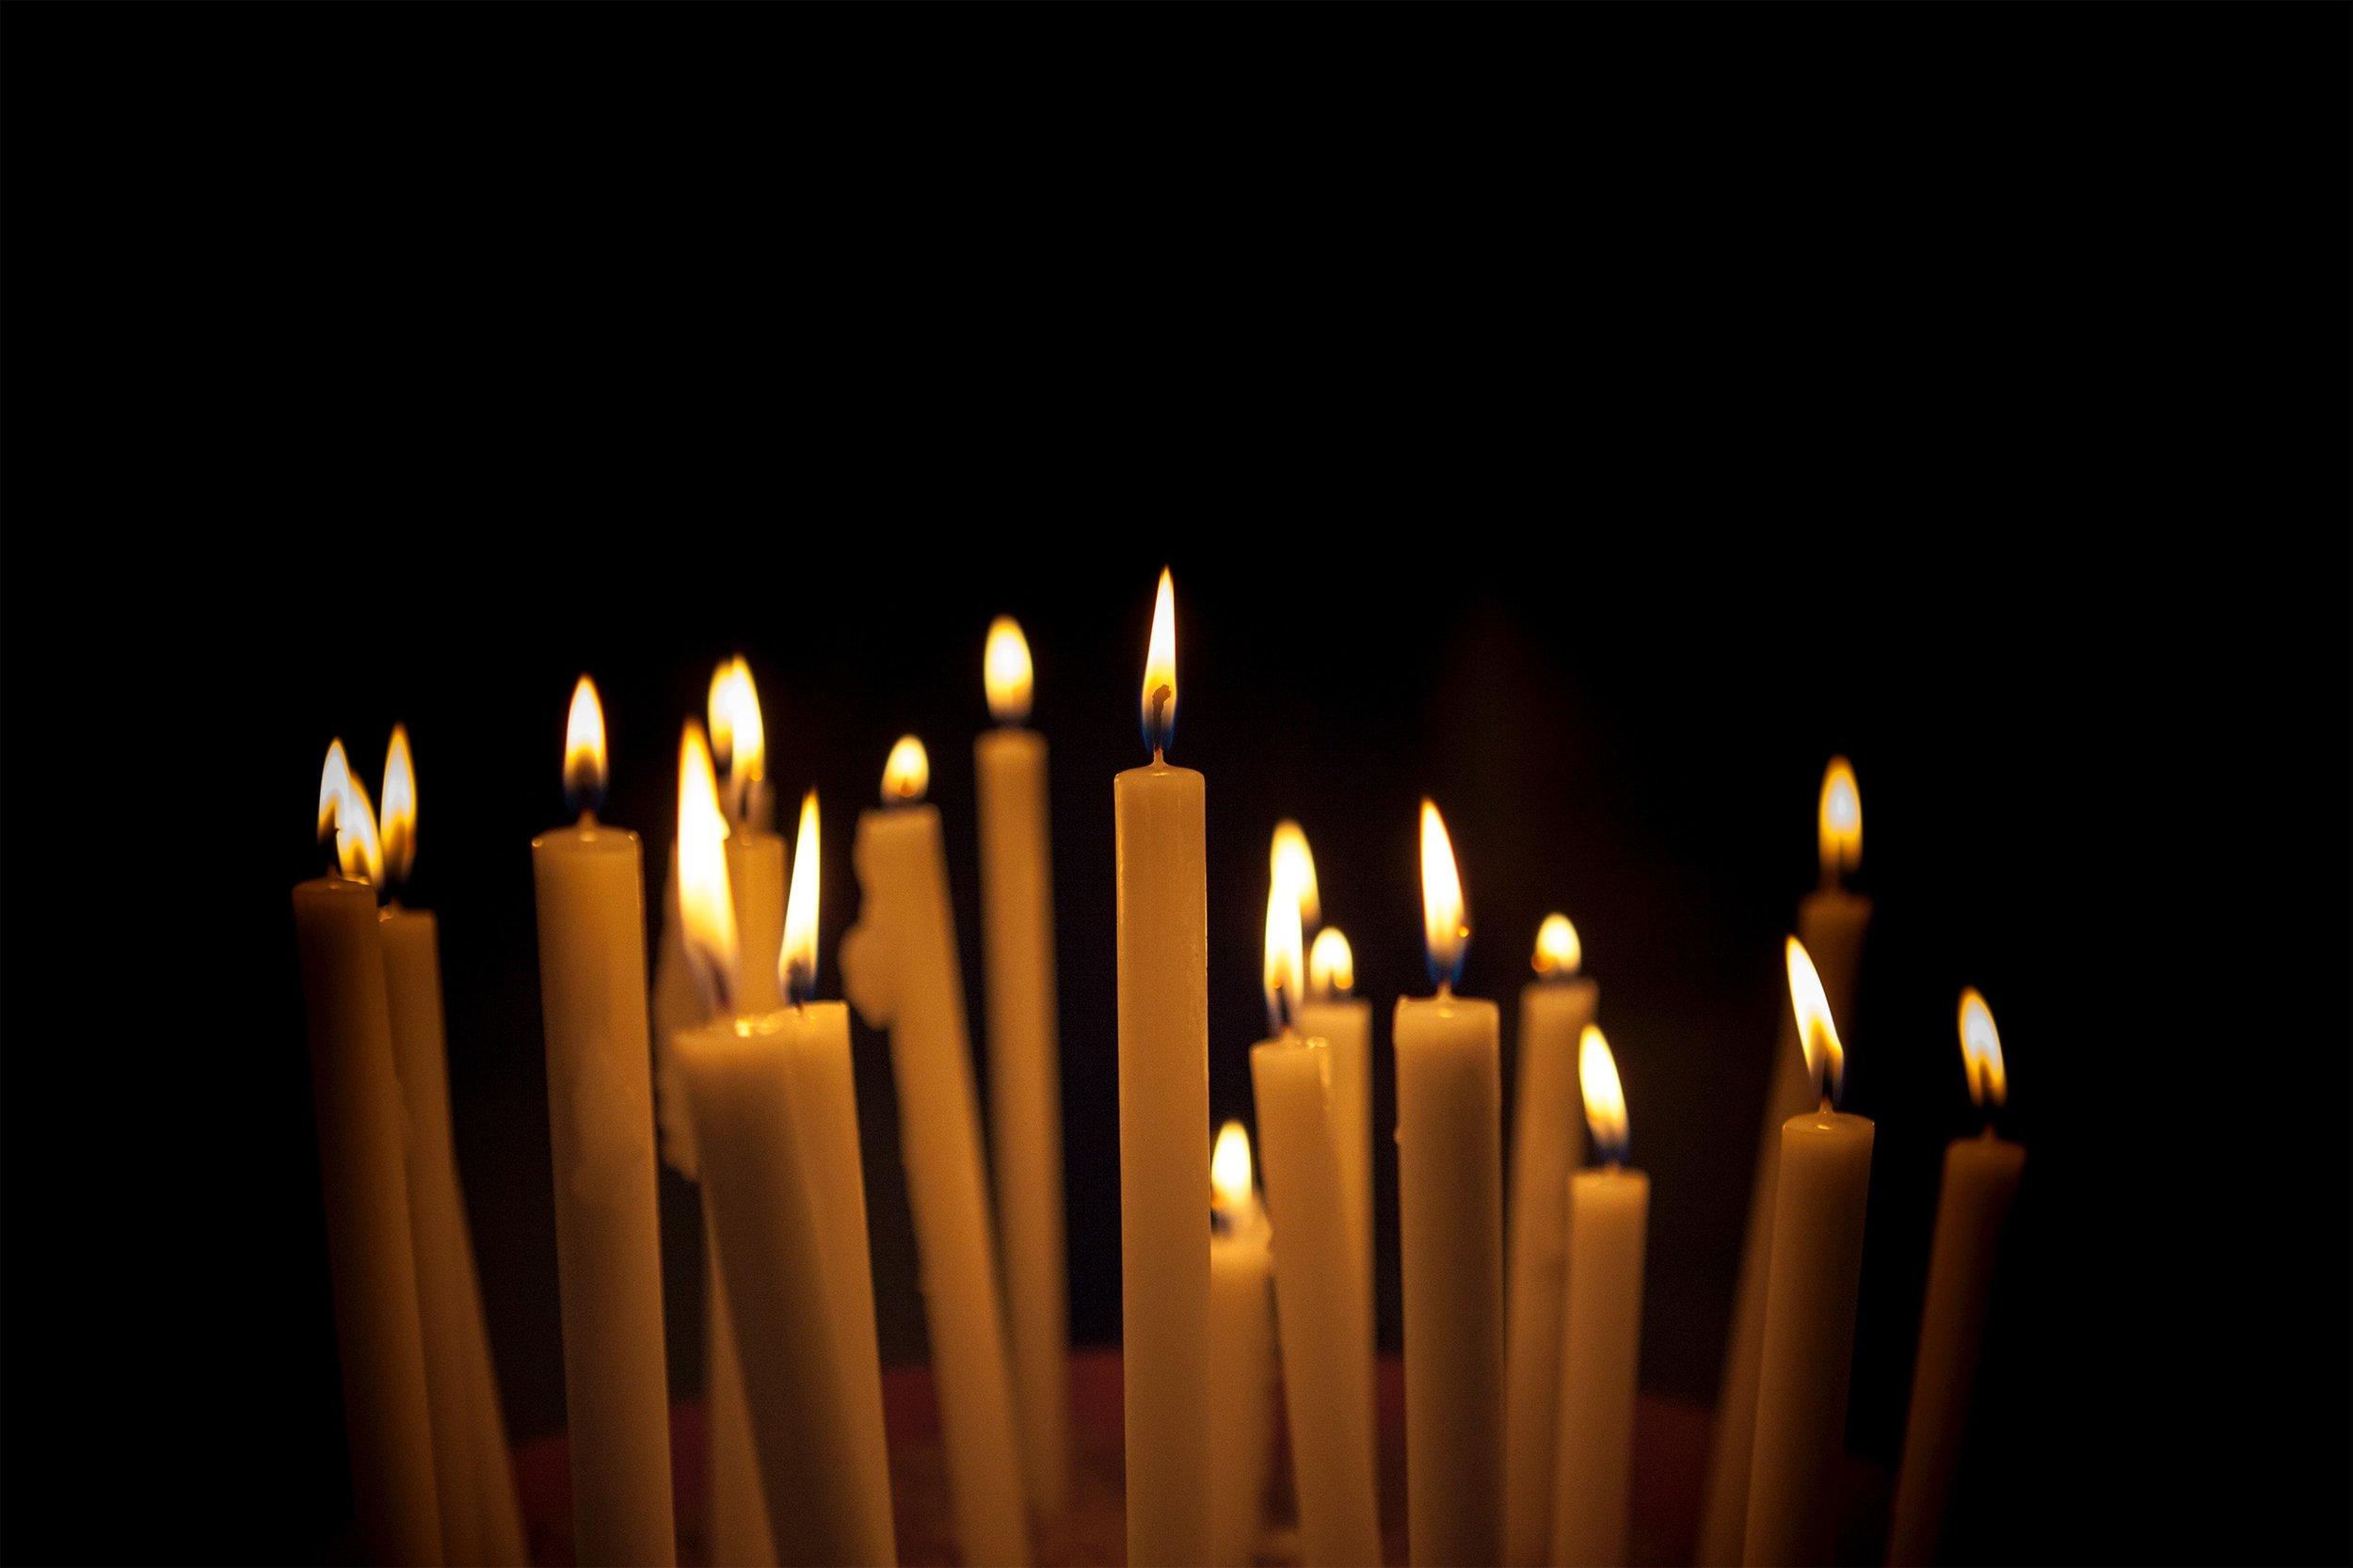 Every celebration involves candles. So many candles.